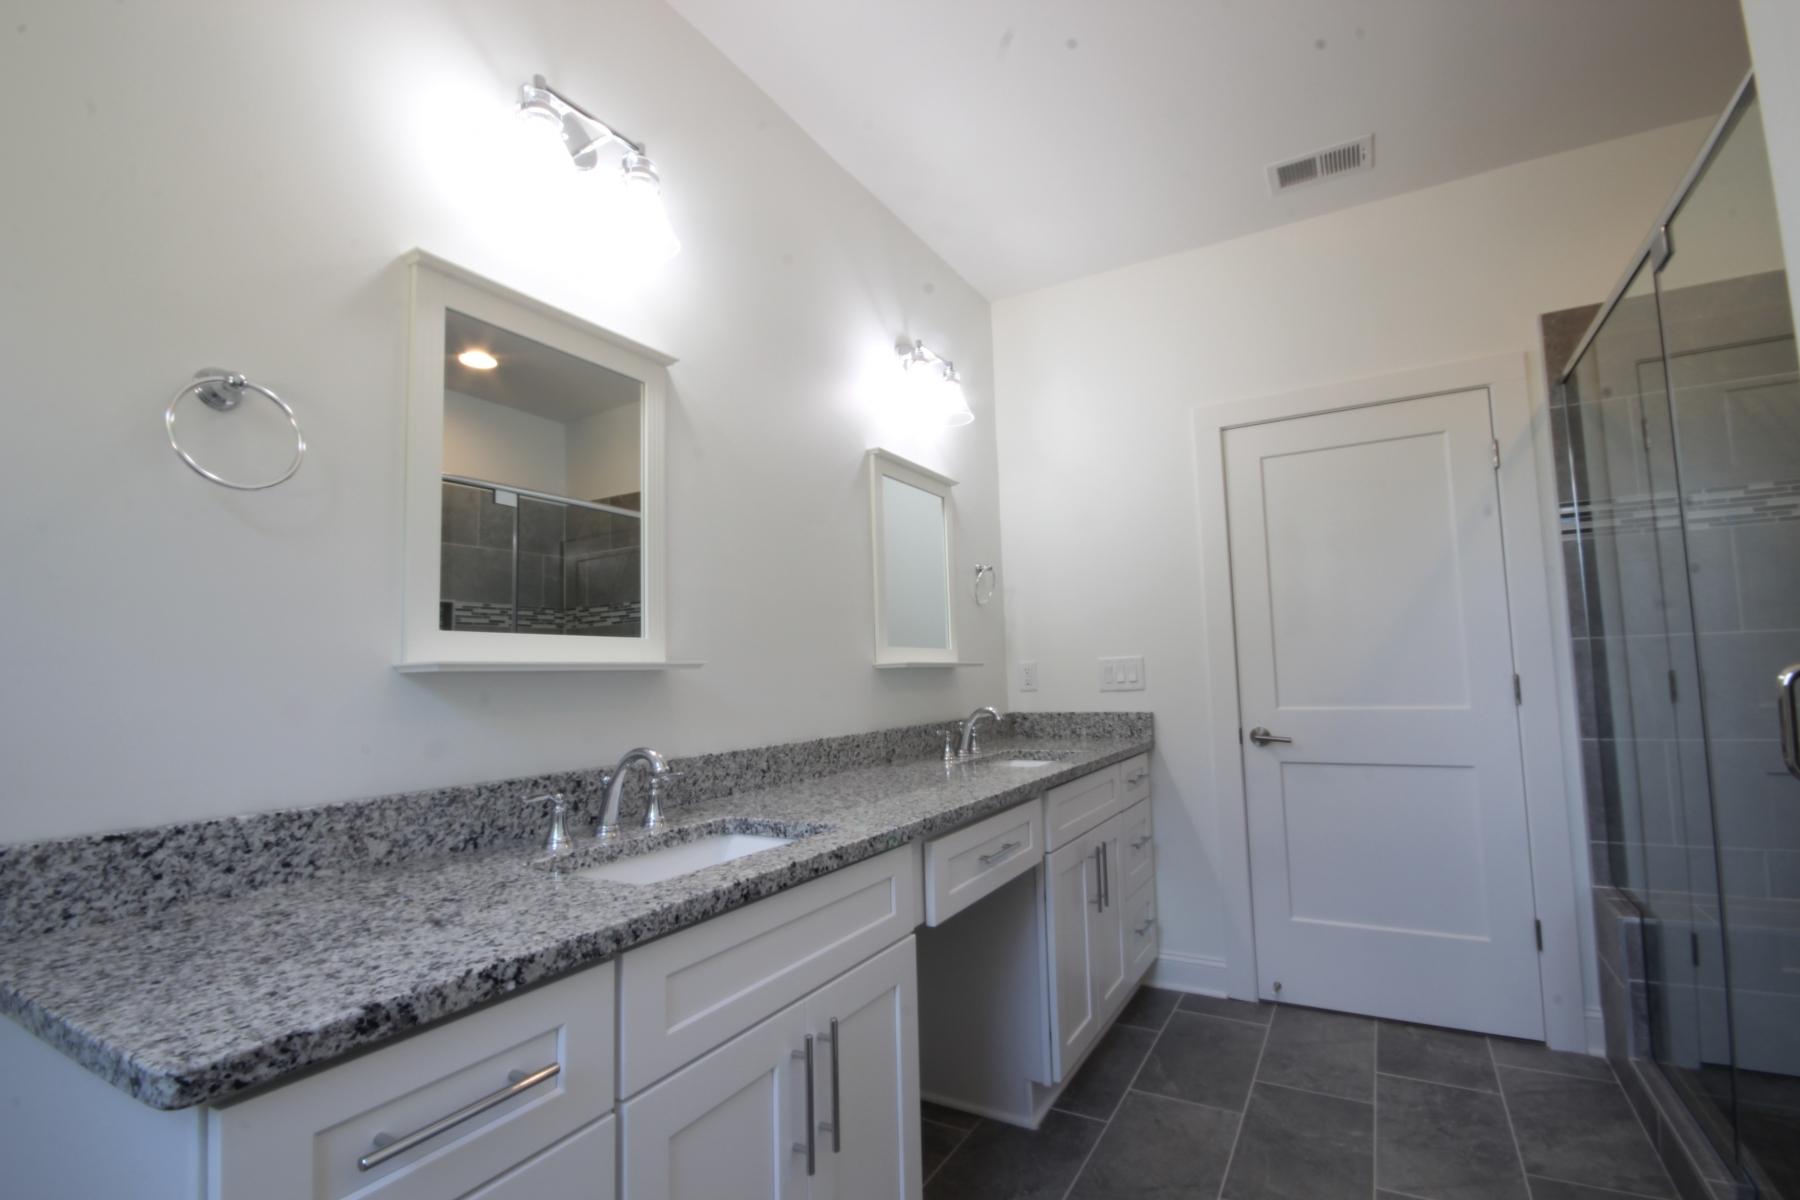 2_761-ss-bathroom-remodel-1